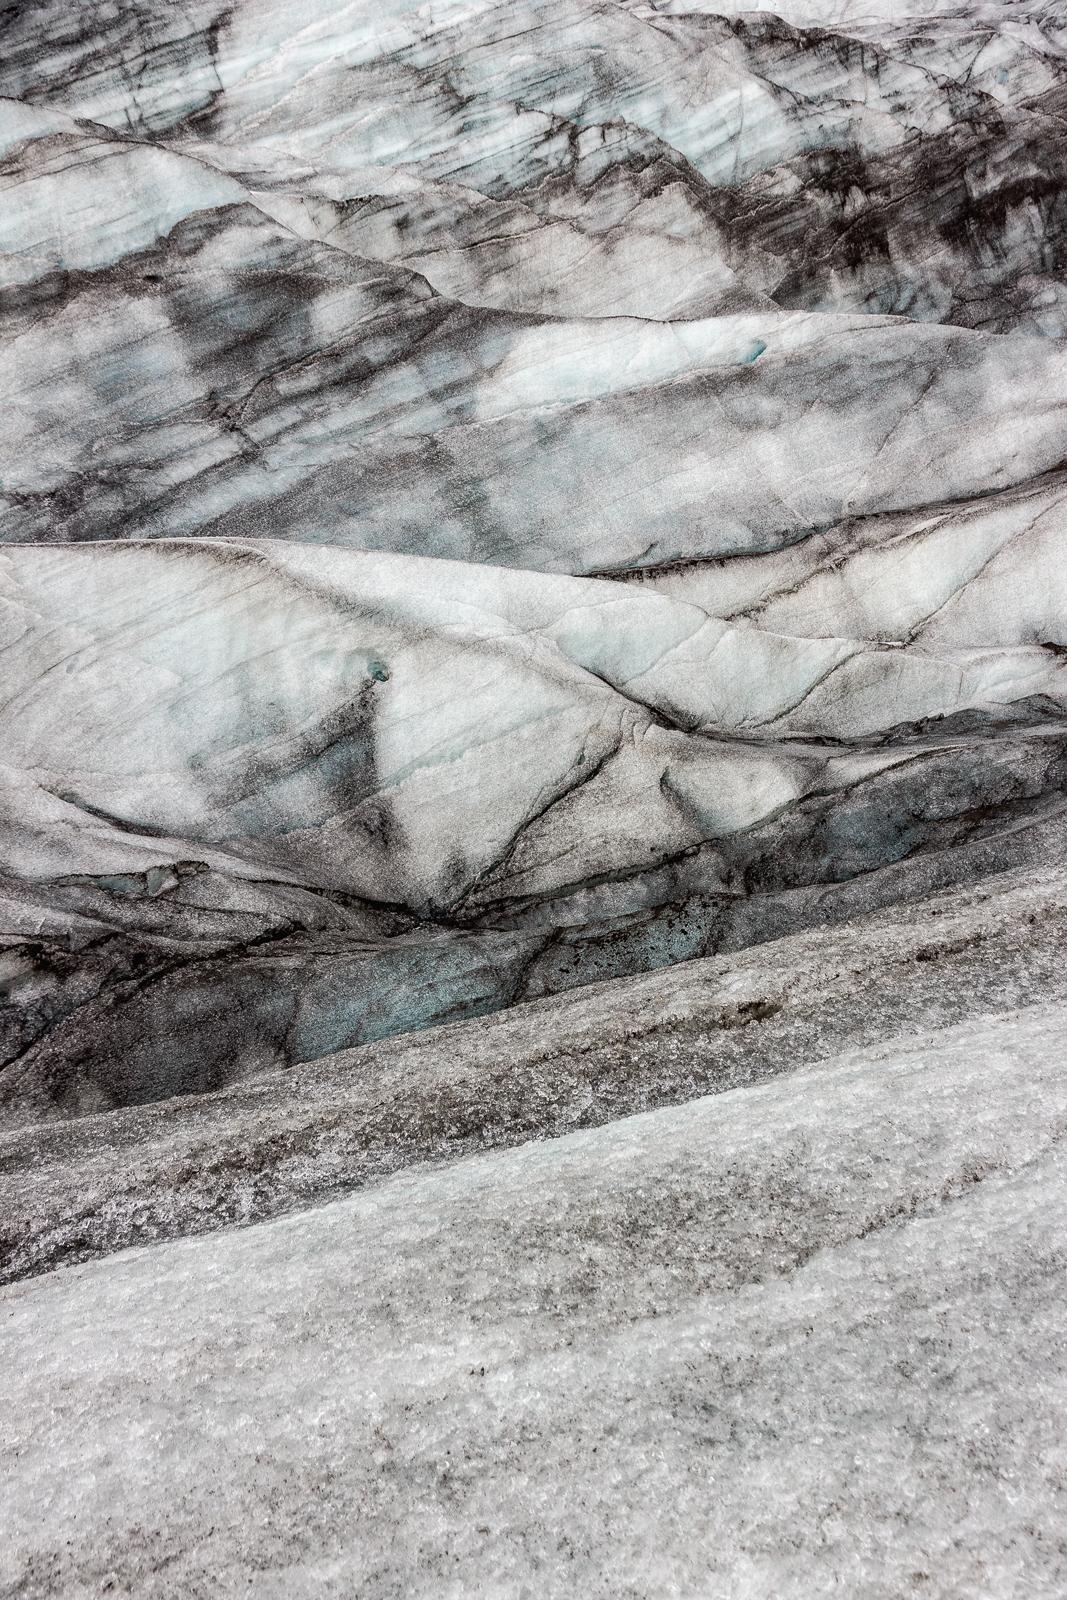 giuliademarchi_iceland3.jpg